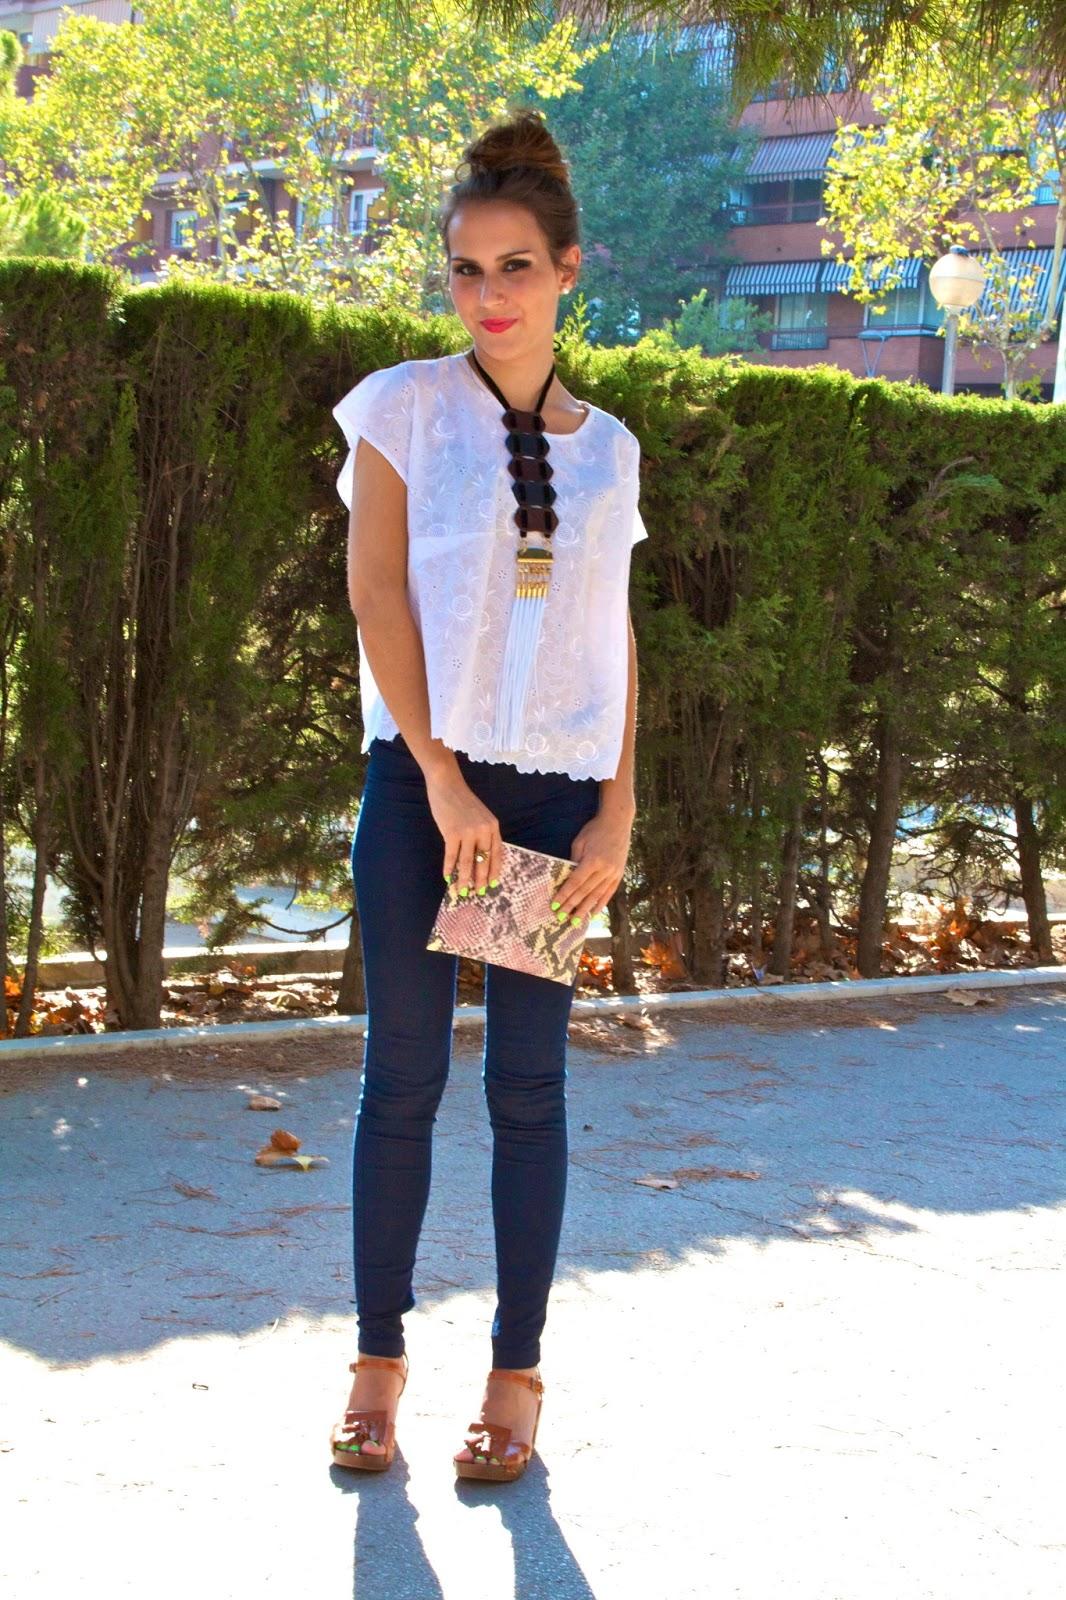 OUTFIT DEL Du00cdA Outfits con T-shirt blanca y pantalones